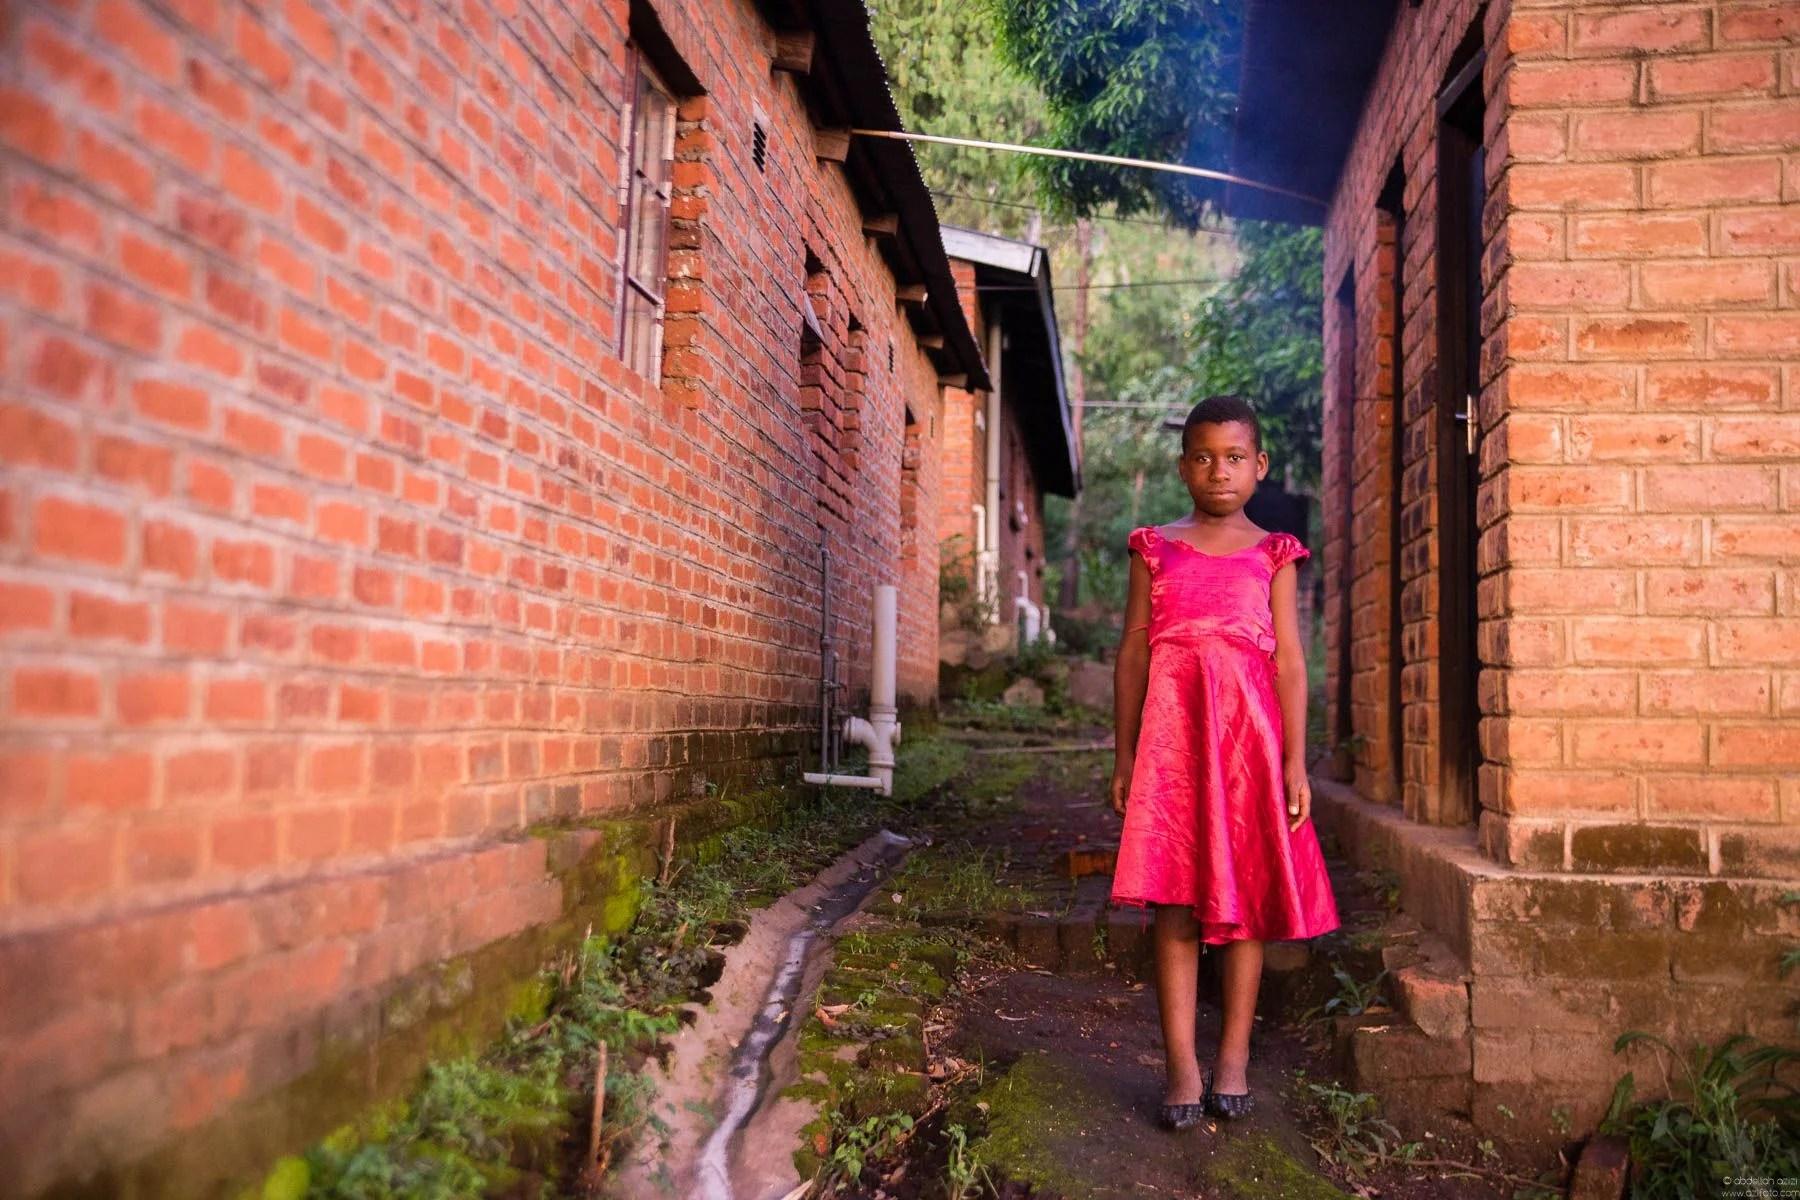 Girl in pink dress -Malawi